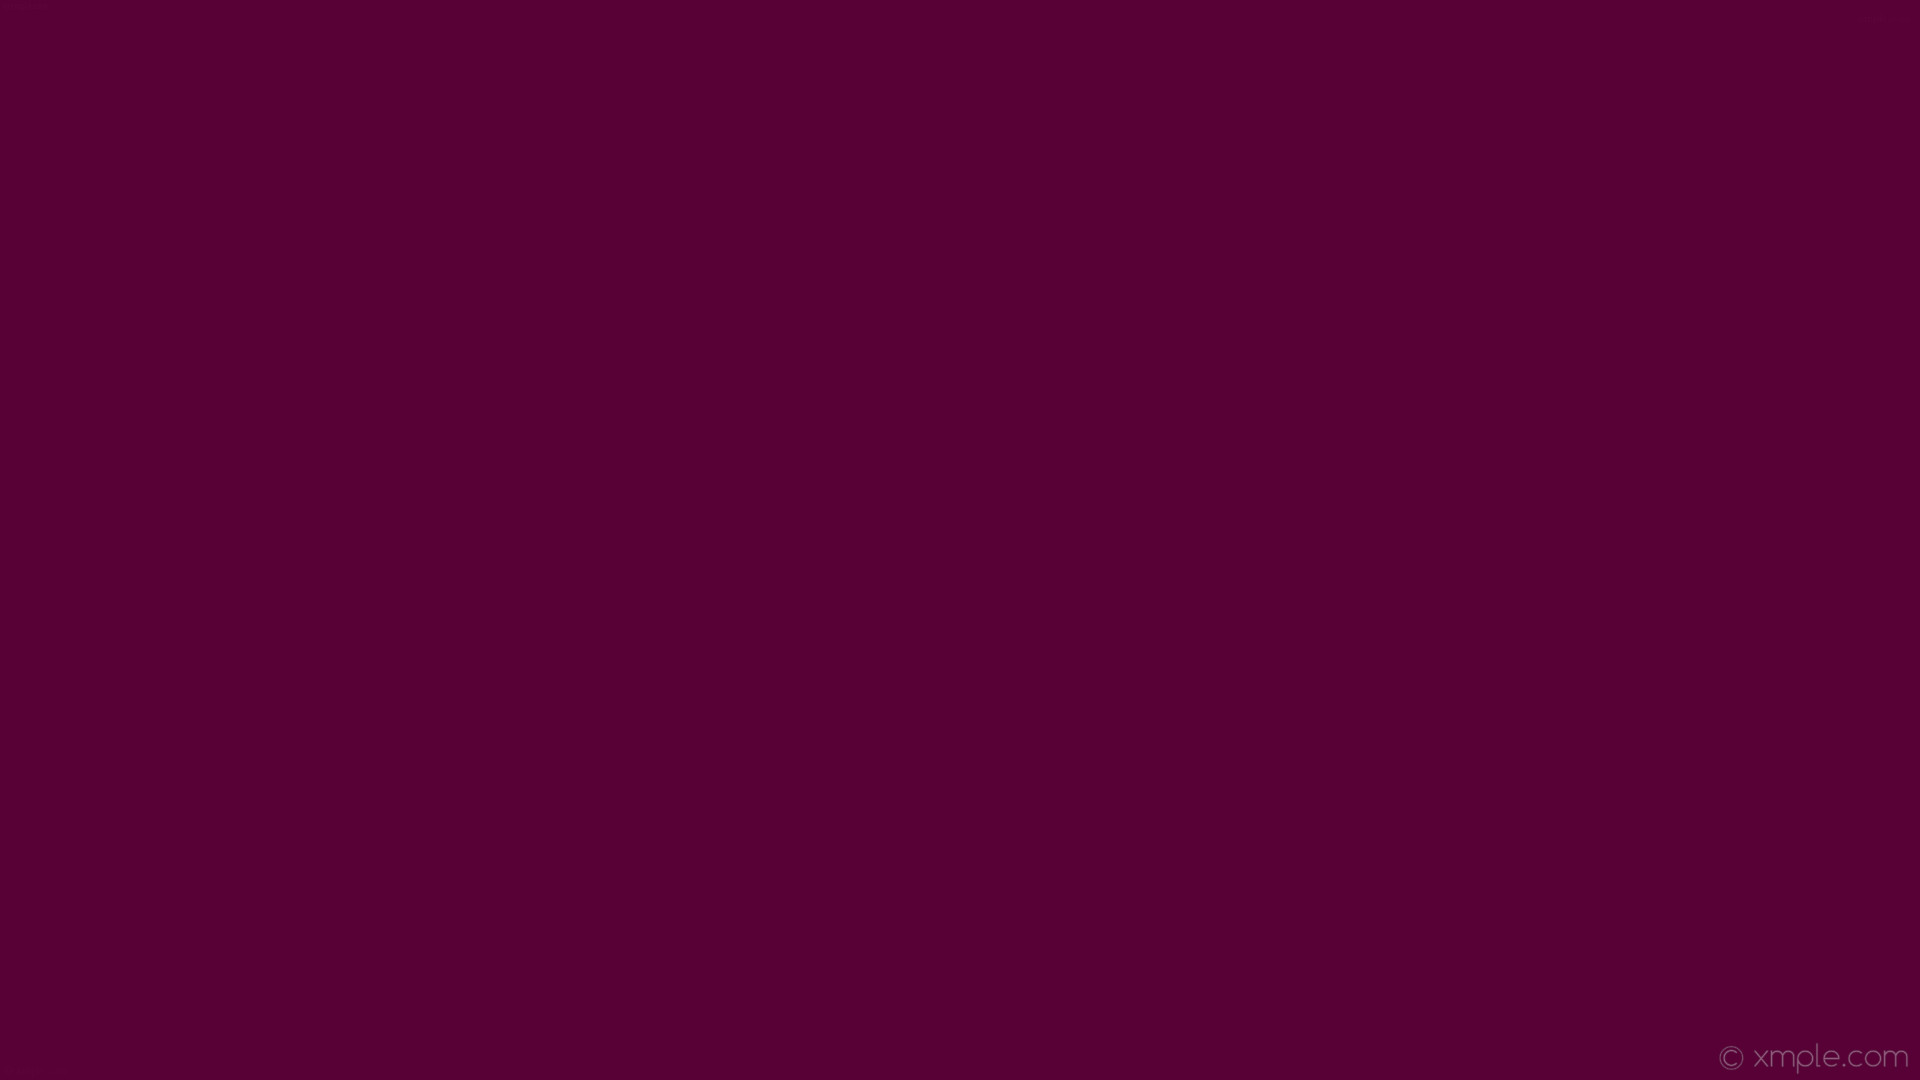 1920x1200 Neon Pink Color Wallpaper